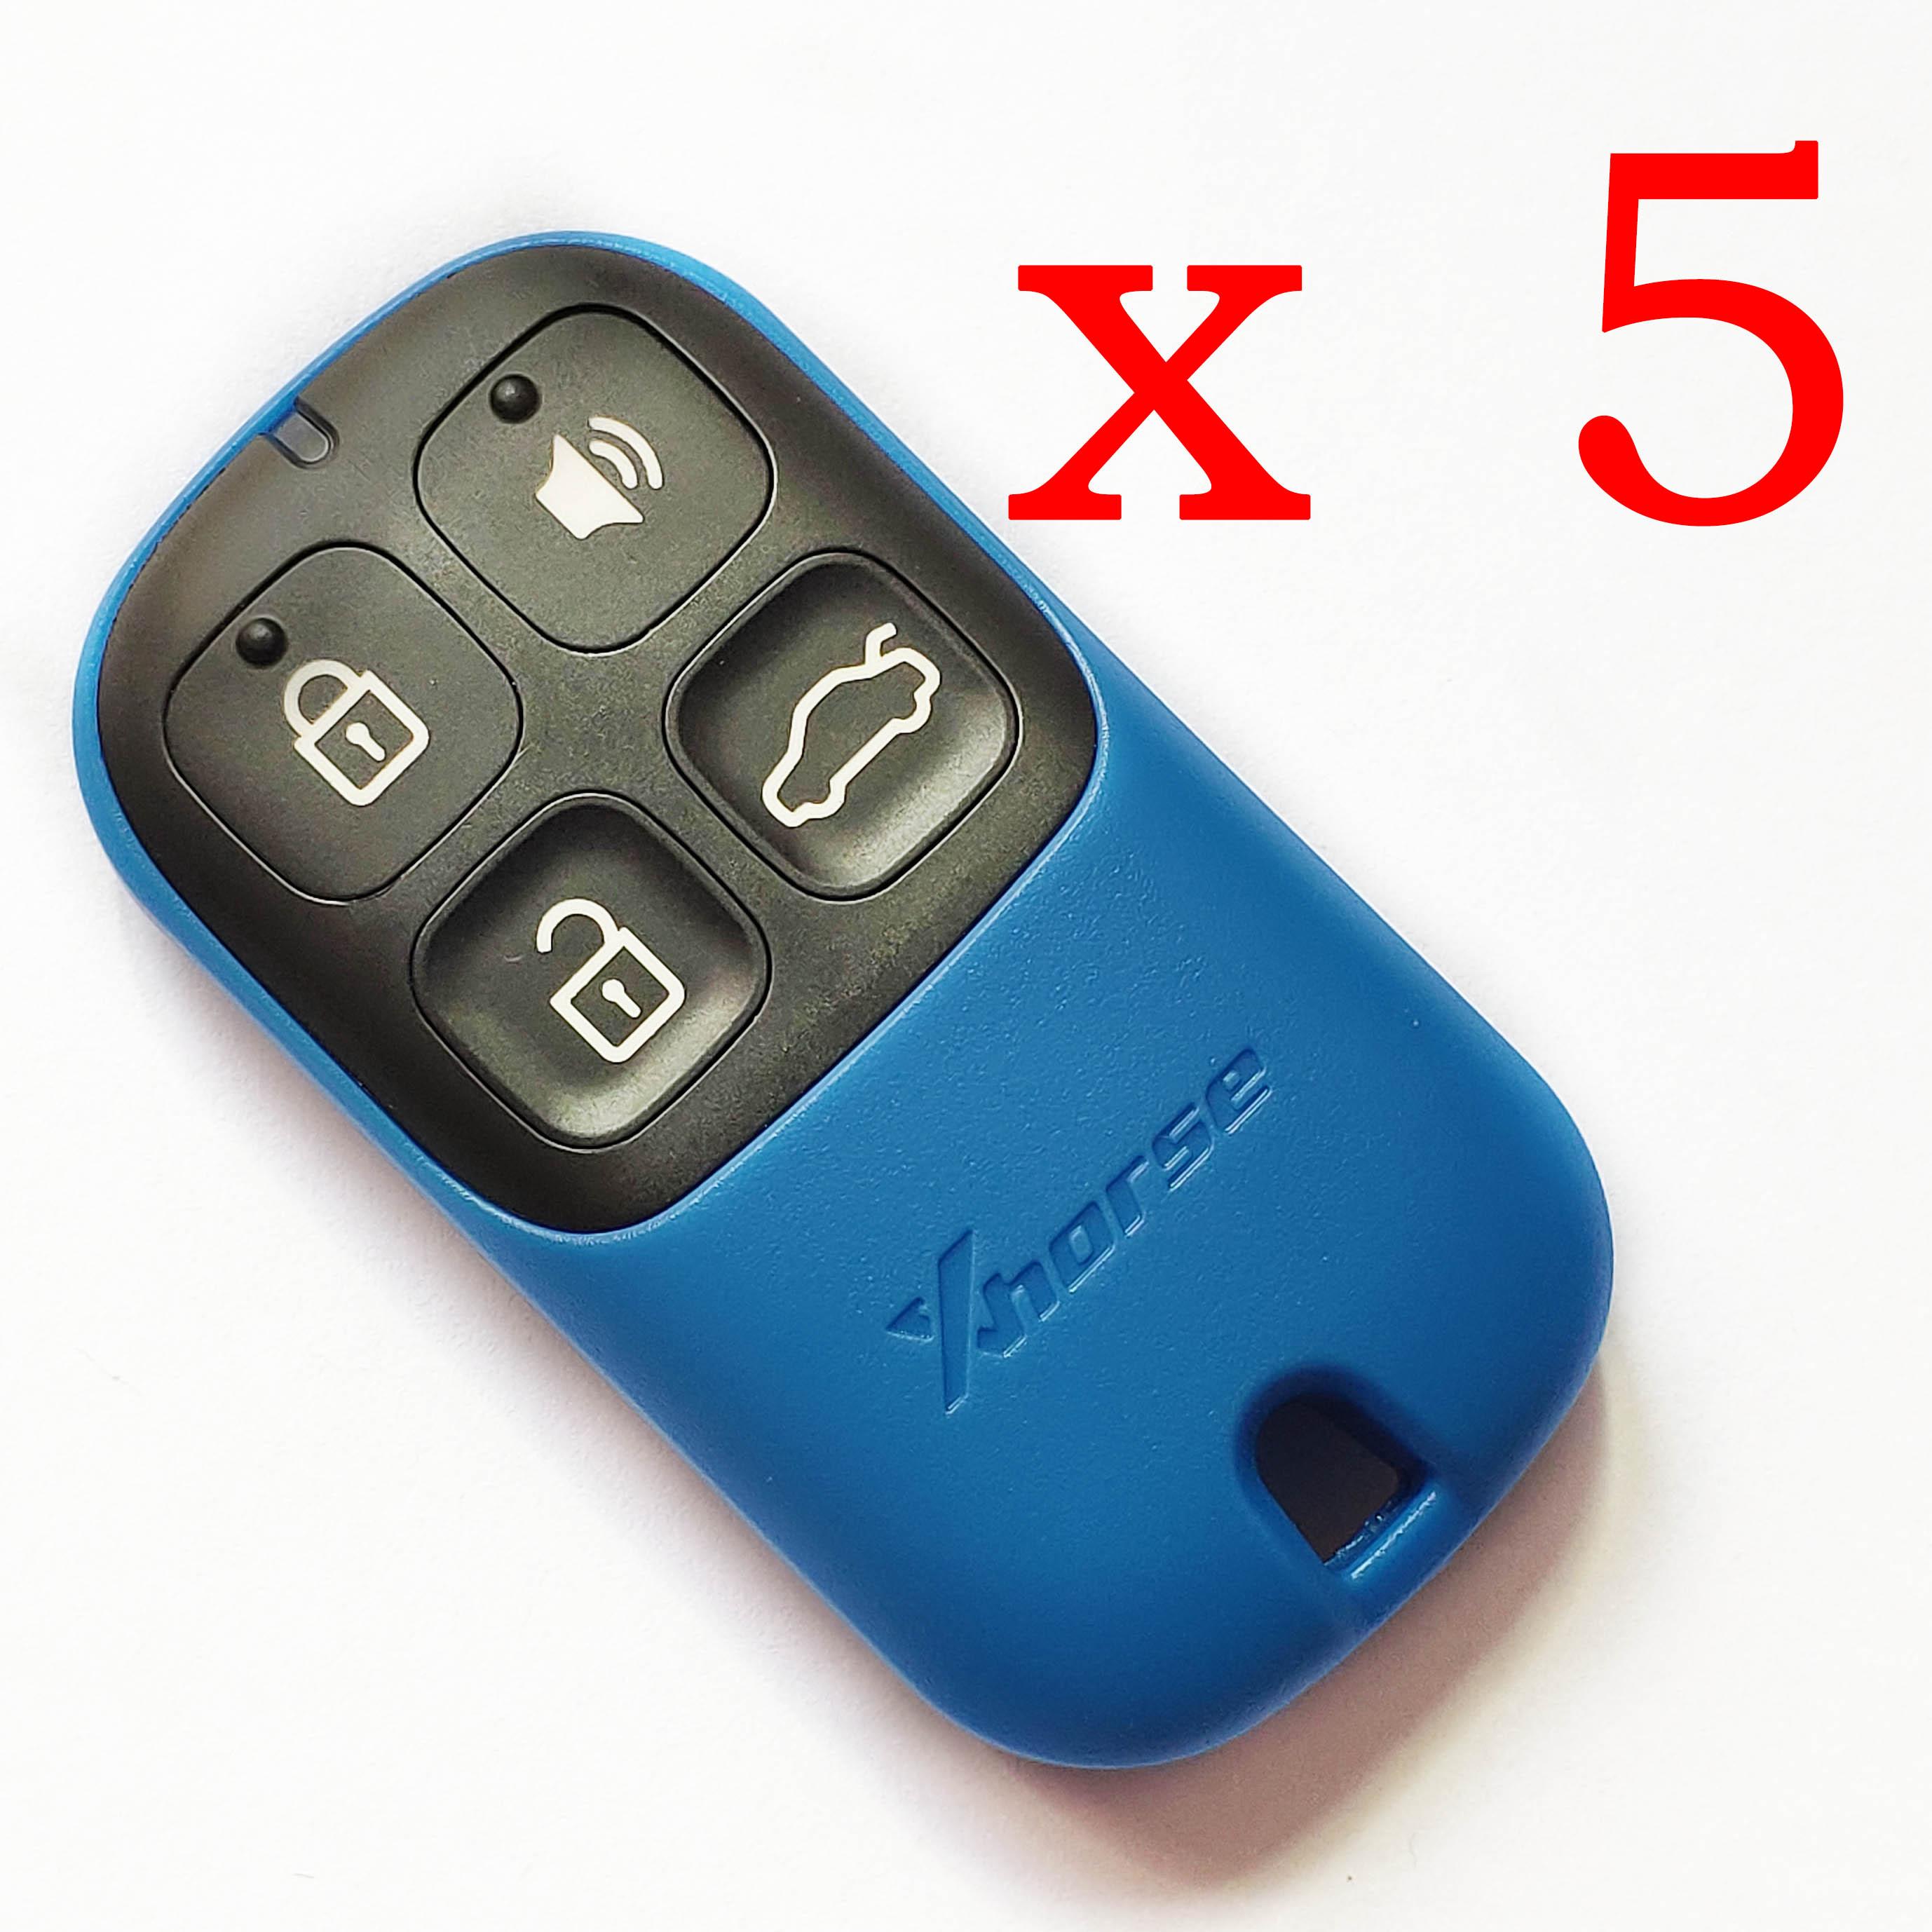 5 pieces Xhorse VVDI Blue Universal Remote Control